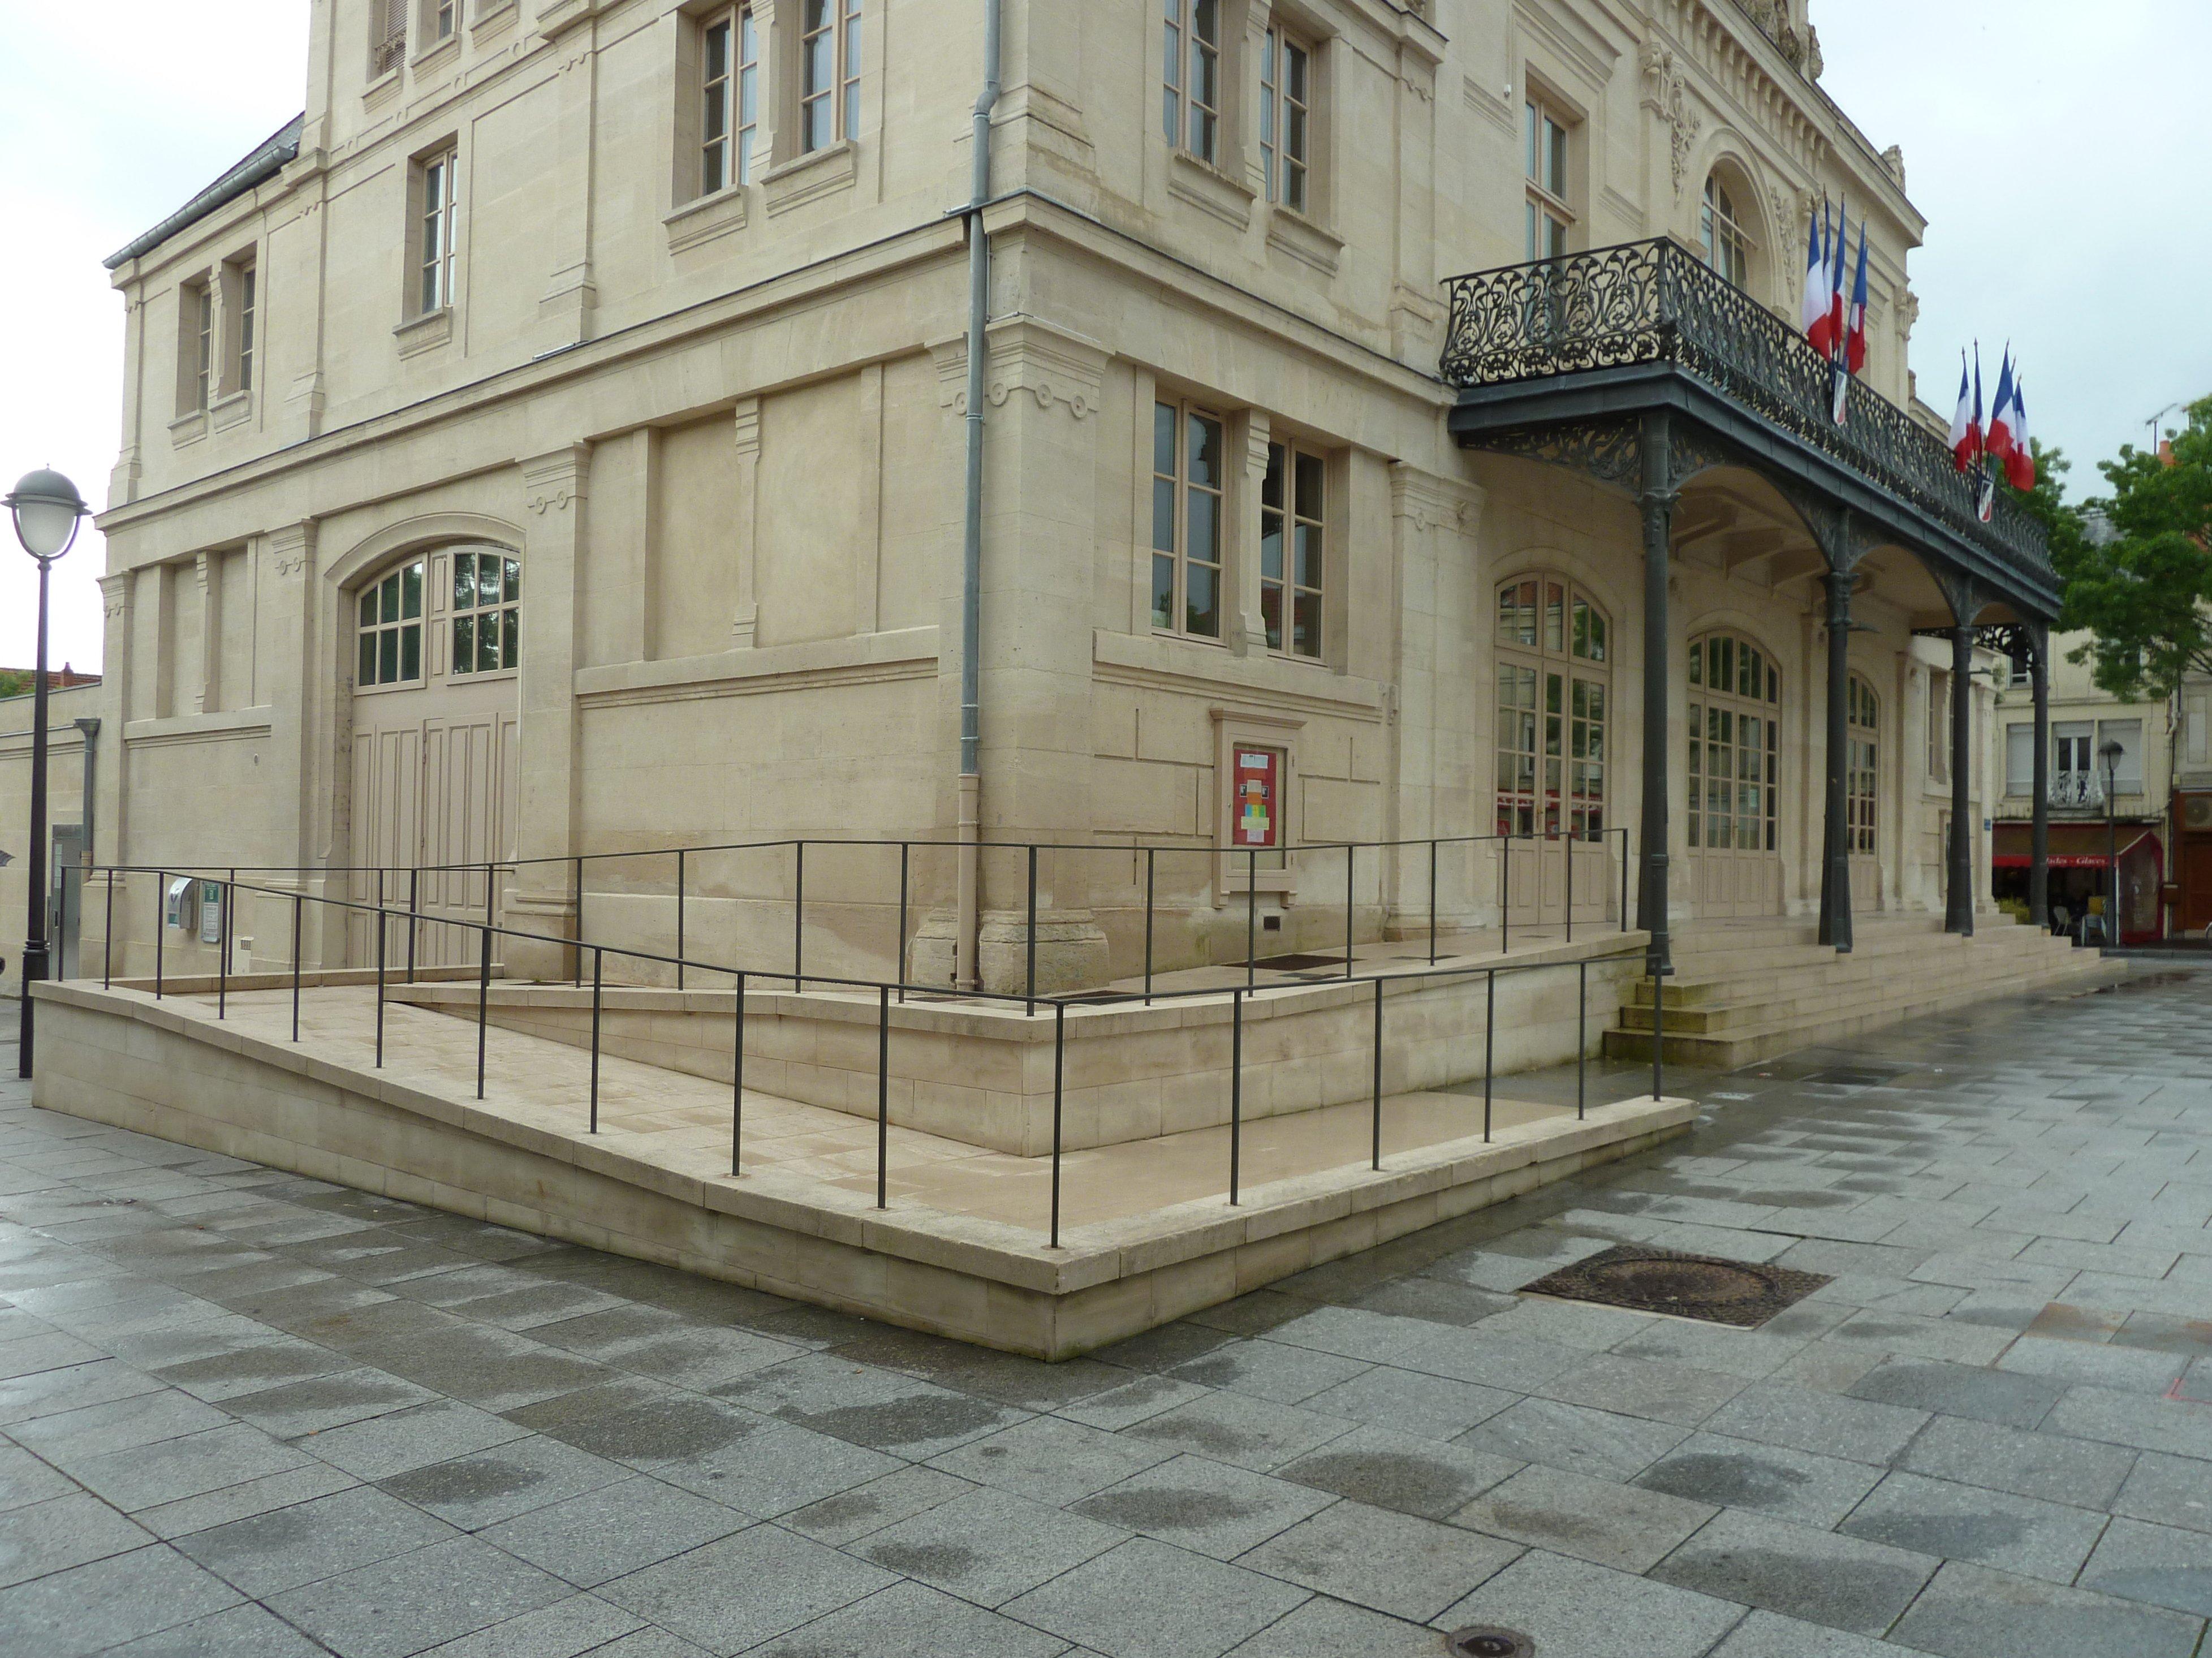 acceso con rampa en obra en edificio patrimonial